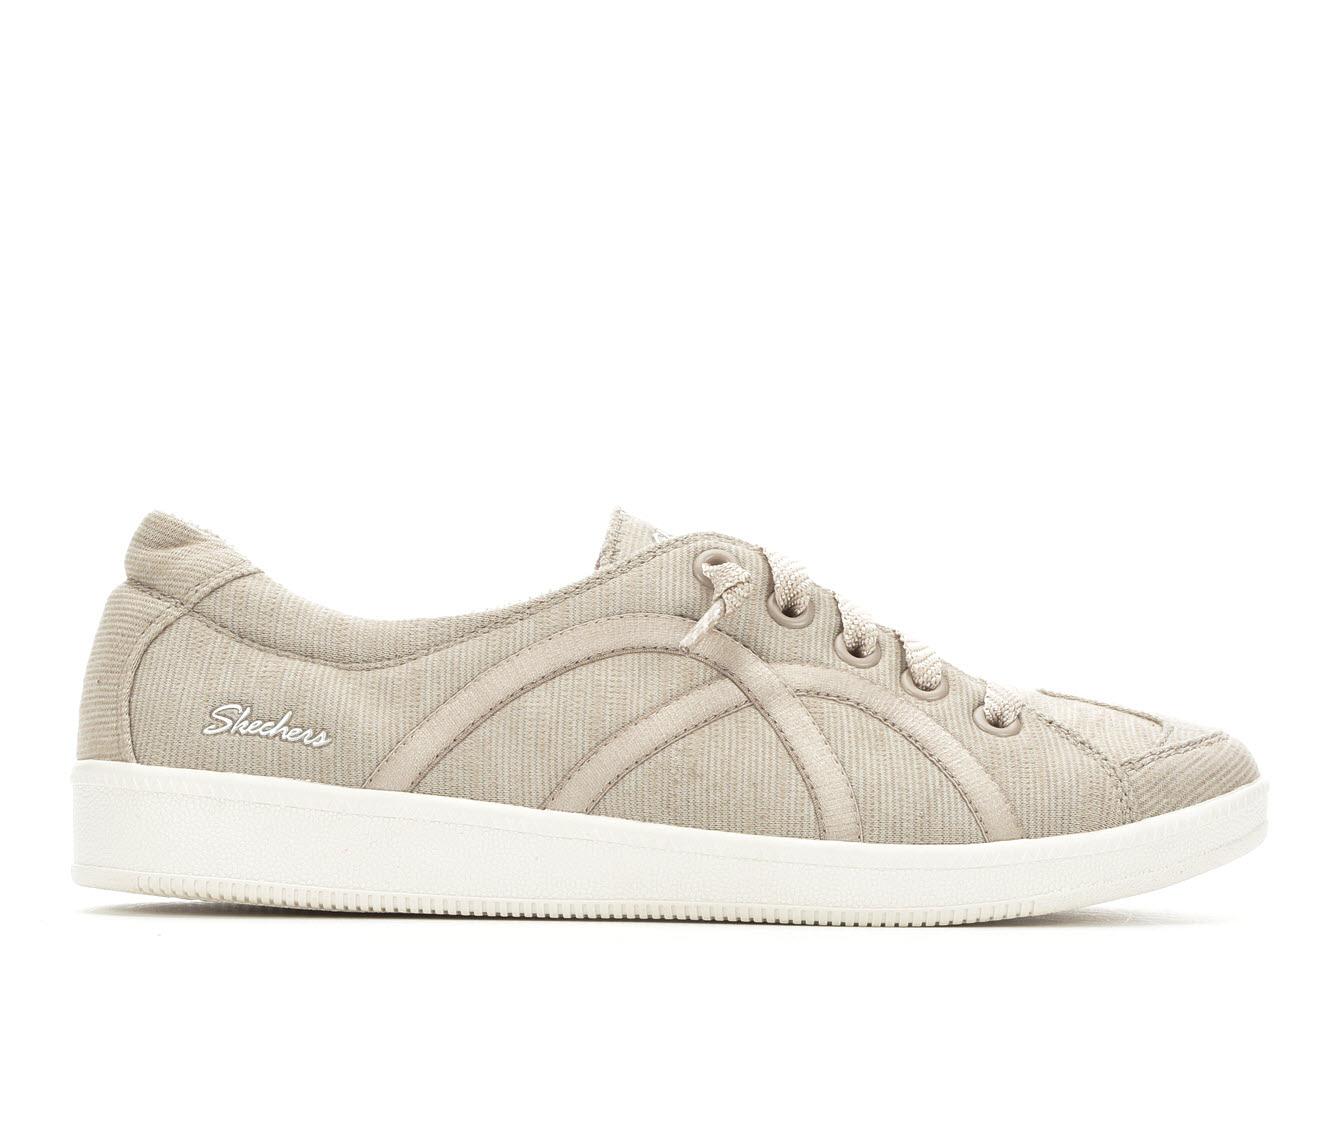 Skechers Take A Walk 23958 Women's Shoe (Brown Canvas)